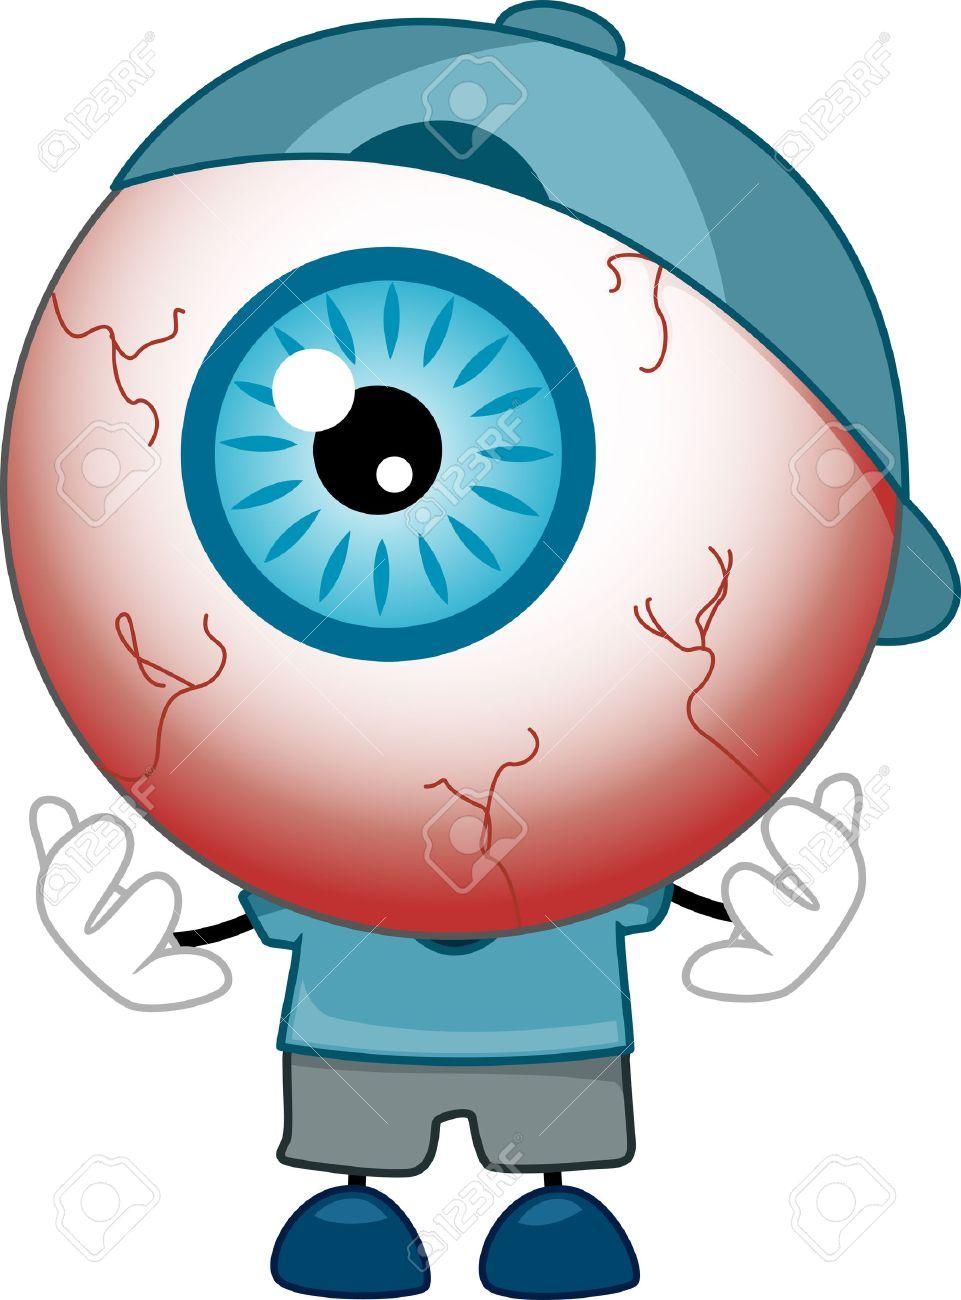 red eyed 眼球マスコット青いシャツ キャップ および靴を着ての